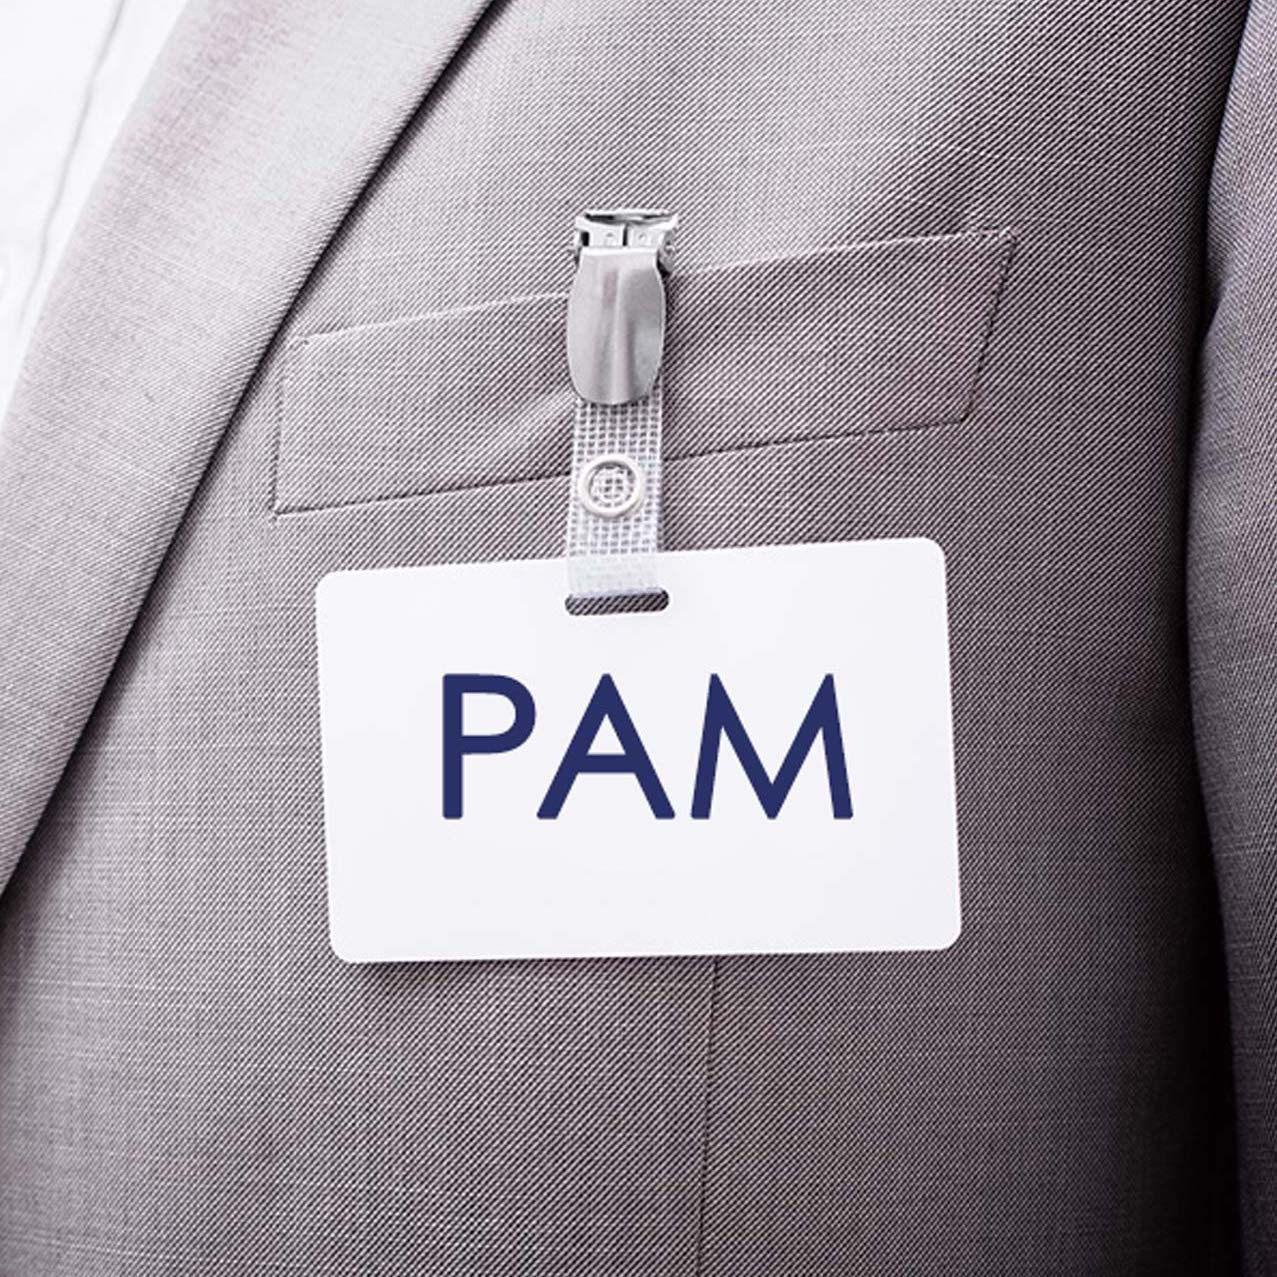 IAM PAM – no you're not!